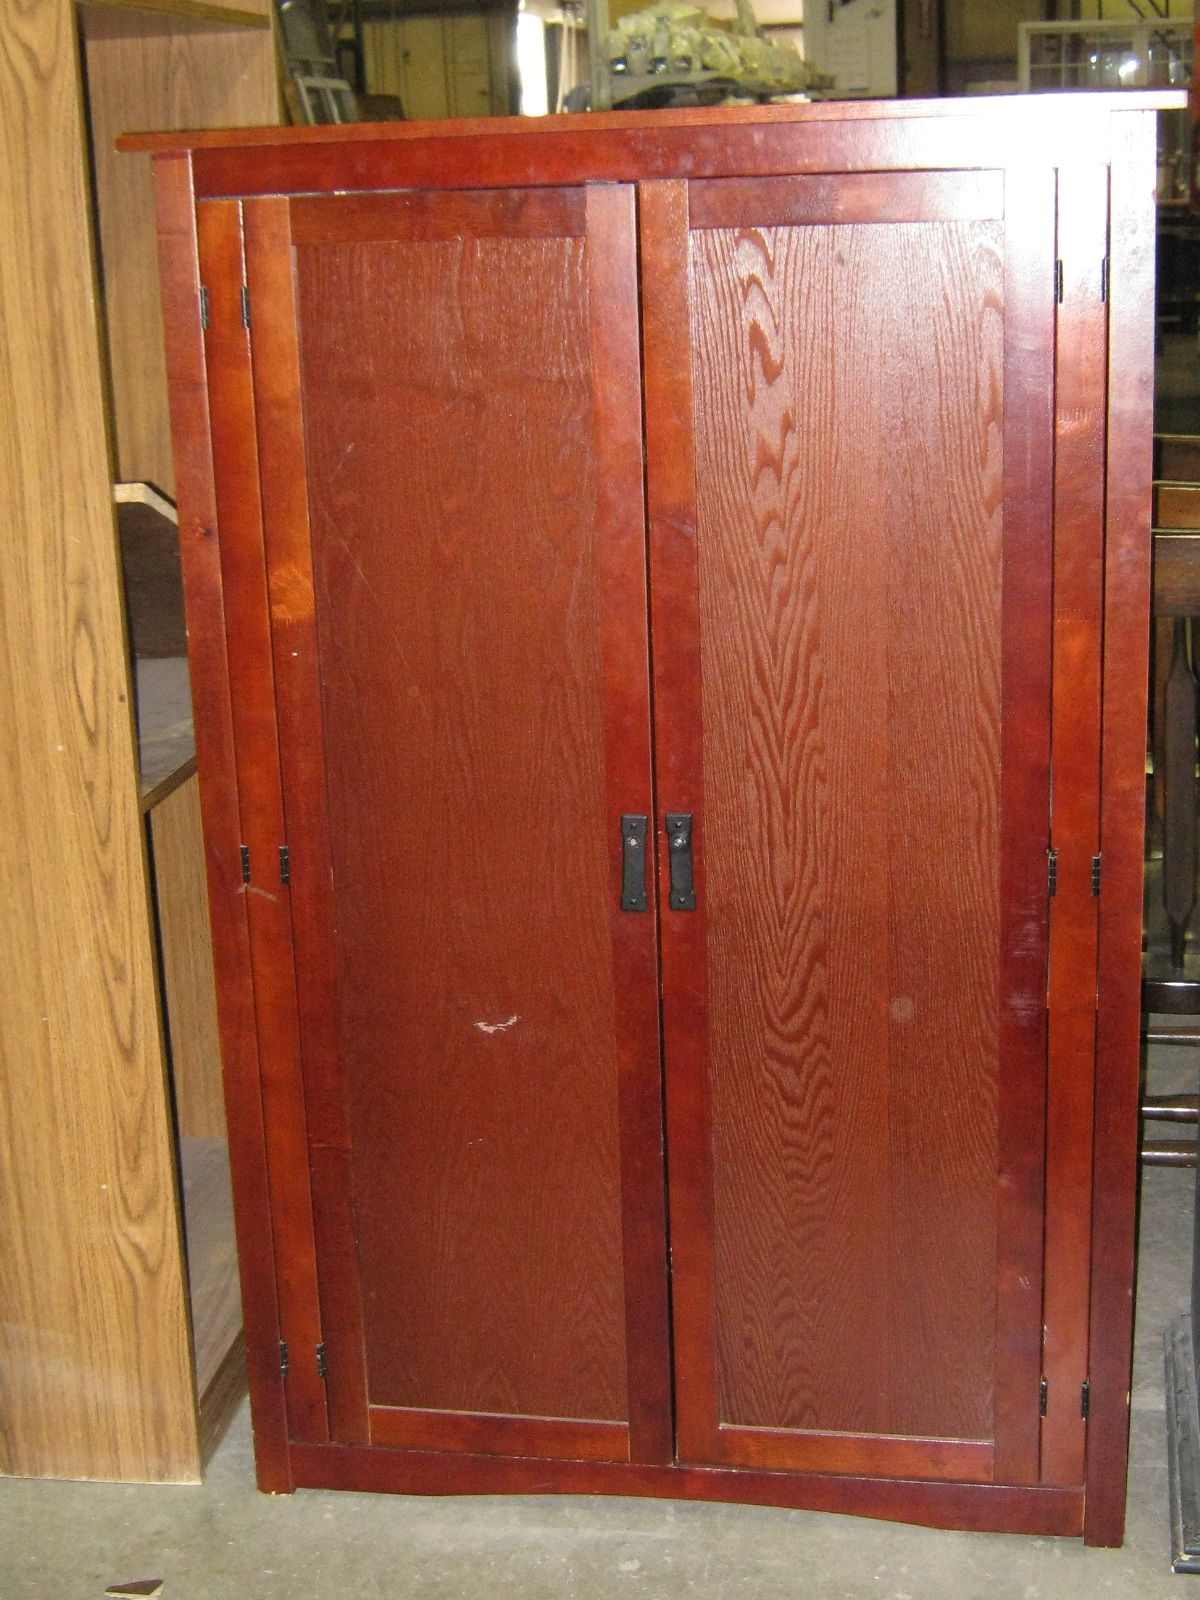 Old cabinet at the Kansas City ReStore Deramus location | Habitat